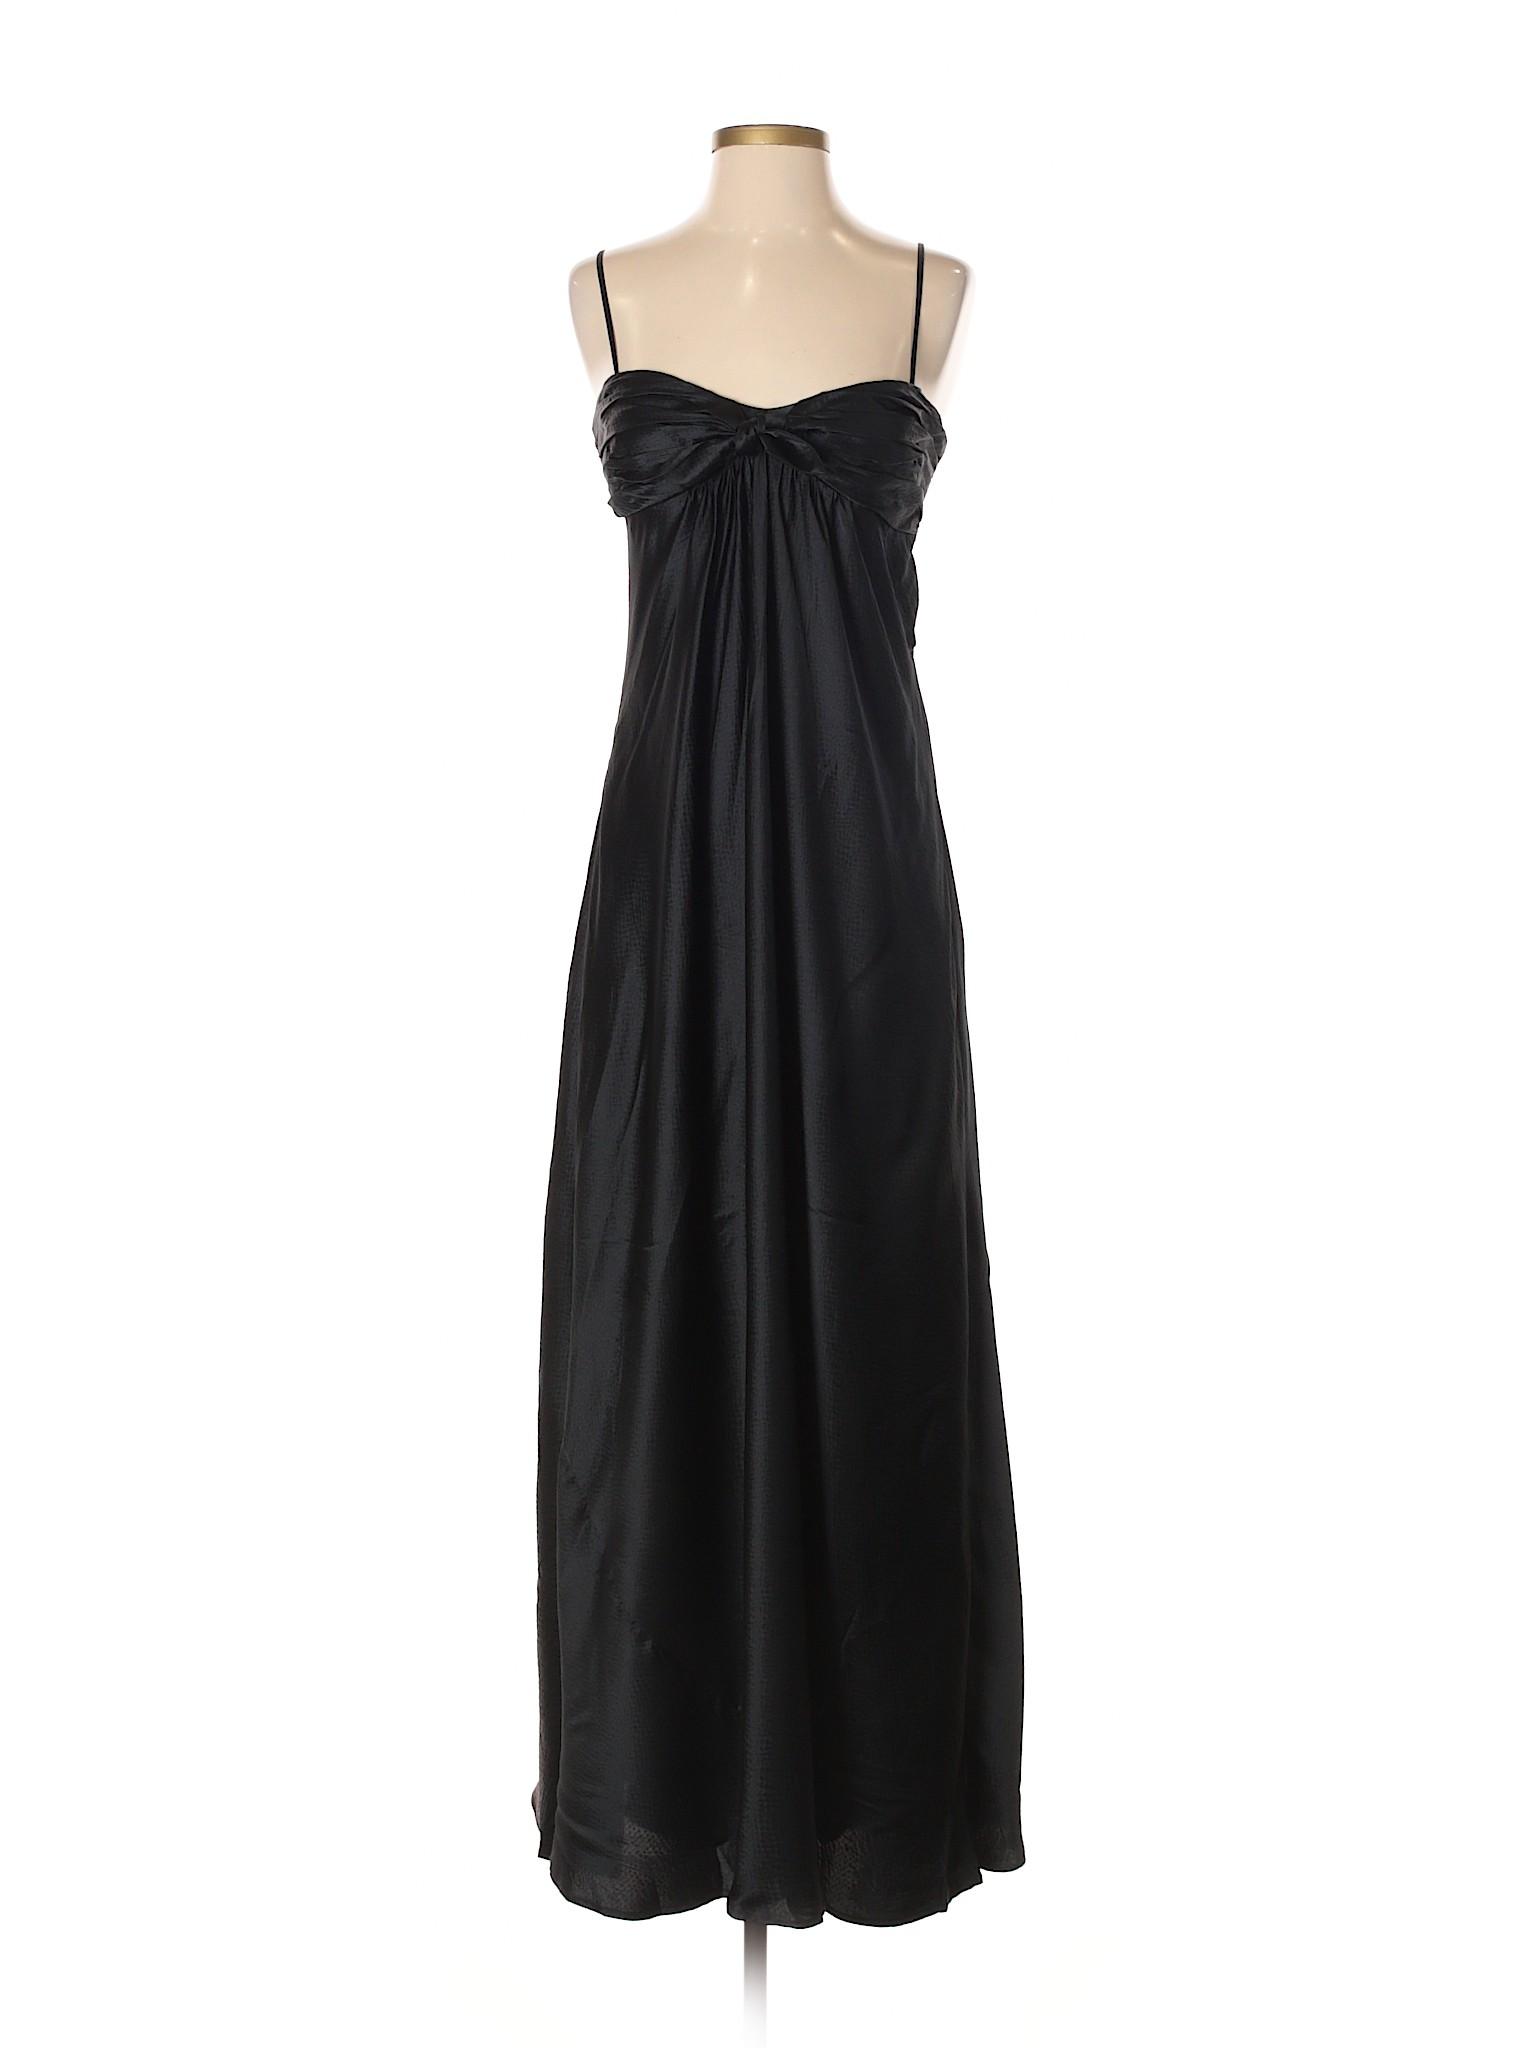 Selling Selling BCBGMAXAZRIA Dress BCBGMAXAZRIA Cocktail n7n5Fw0qpx